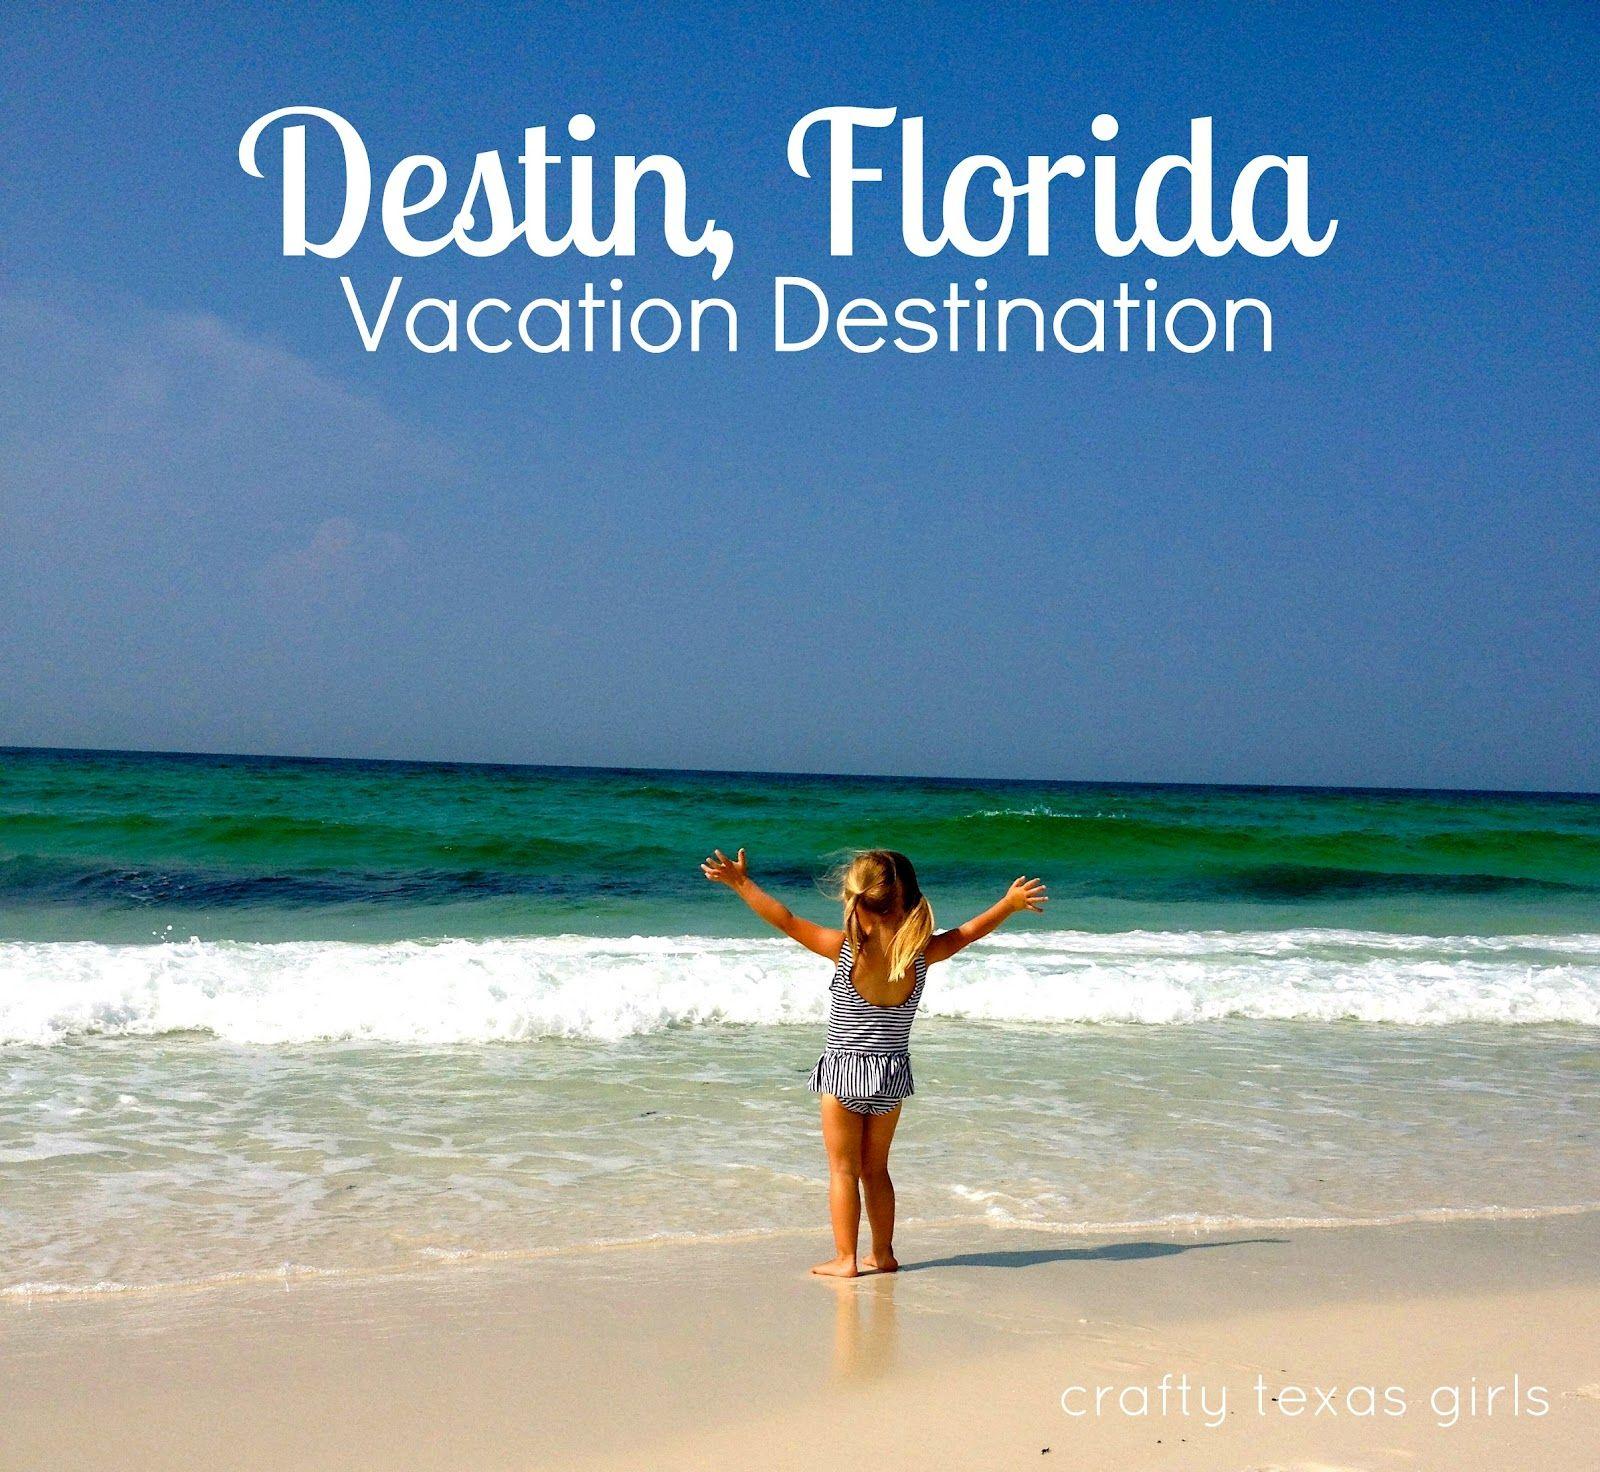 crafty texas girls vacation destination destin florida a good